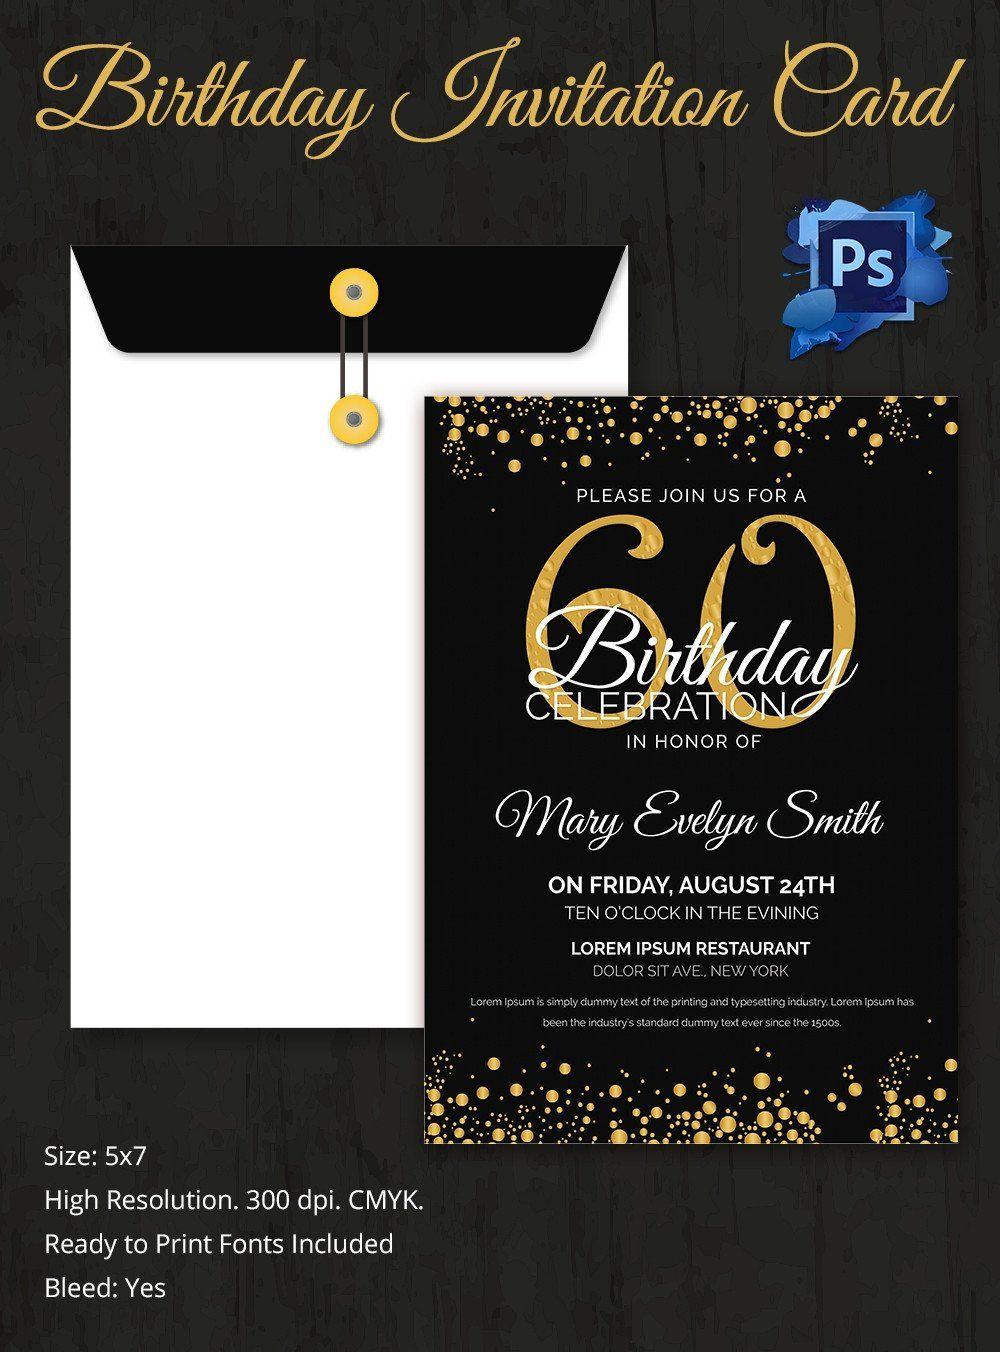 60th Birthday Invitation Template Birthday Invitation Template 32 Free Word Pdf 60th Birthday Invitations Party Invite Template 60th Birthday Party Invitations Free 60th birthday invitations template